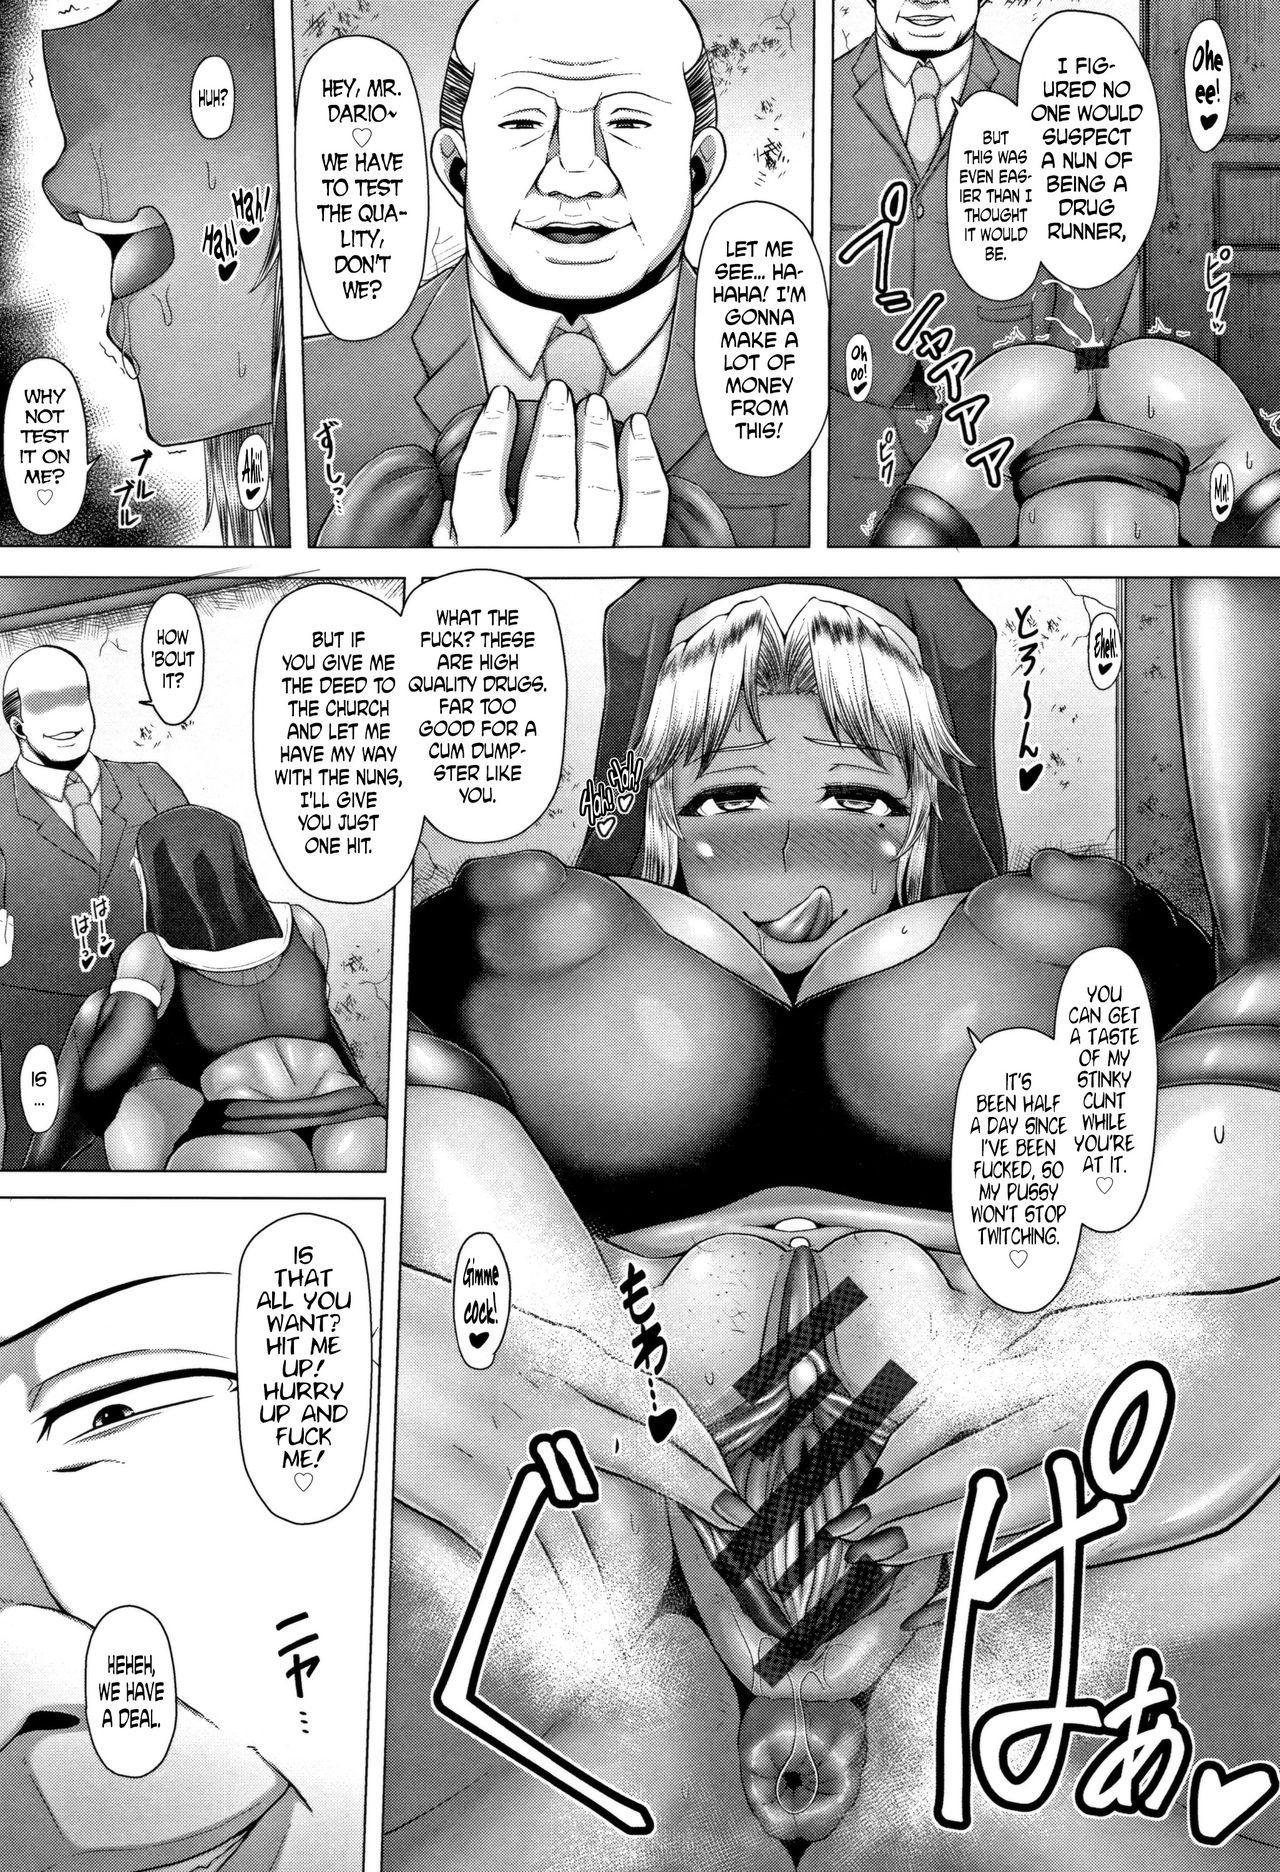 [Inoue Nanaki] Joushiki Daha! Kuro Gal Bitch-ka Seikatsu Ch. 1-3, 5-8 [English] [Dark Mac + N04h] 58